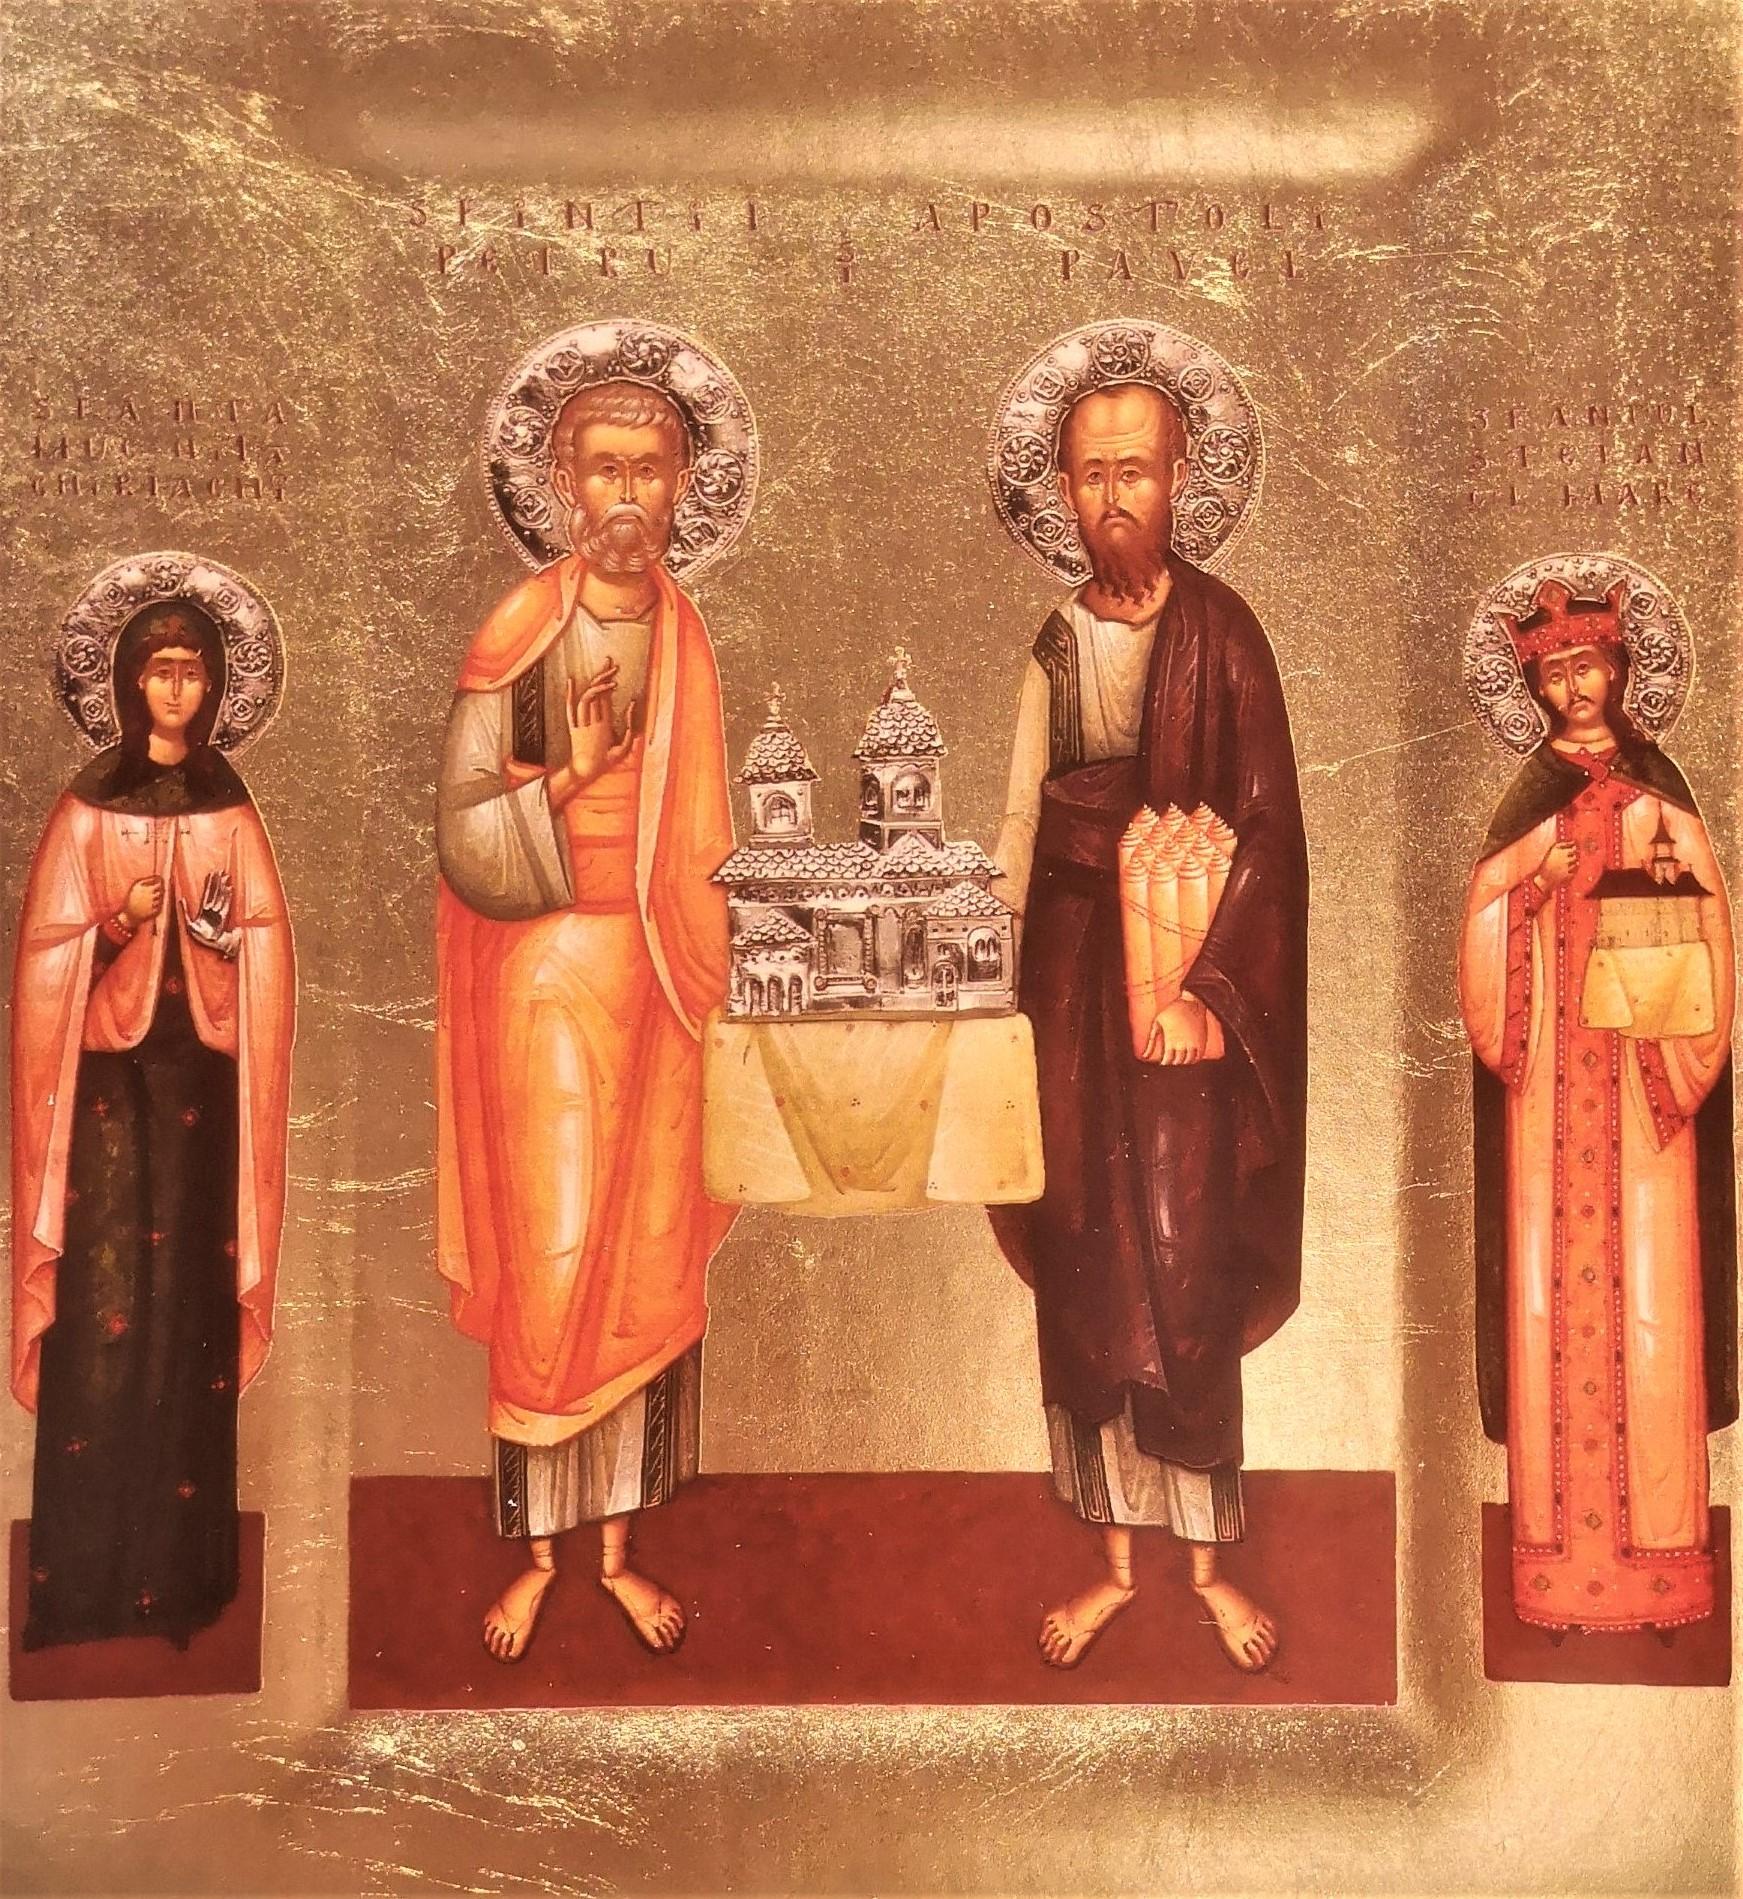 Icoana Relicvar a Sfintilor Apostoli Petru si Pavel si racla Sfintei Chiriachi - Episcopia Husilor